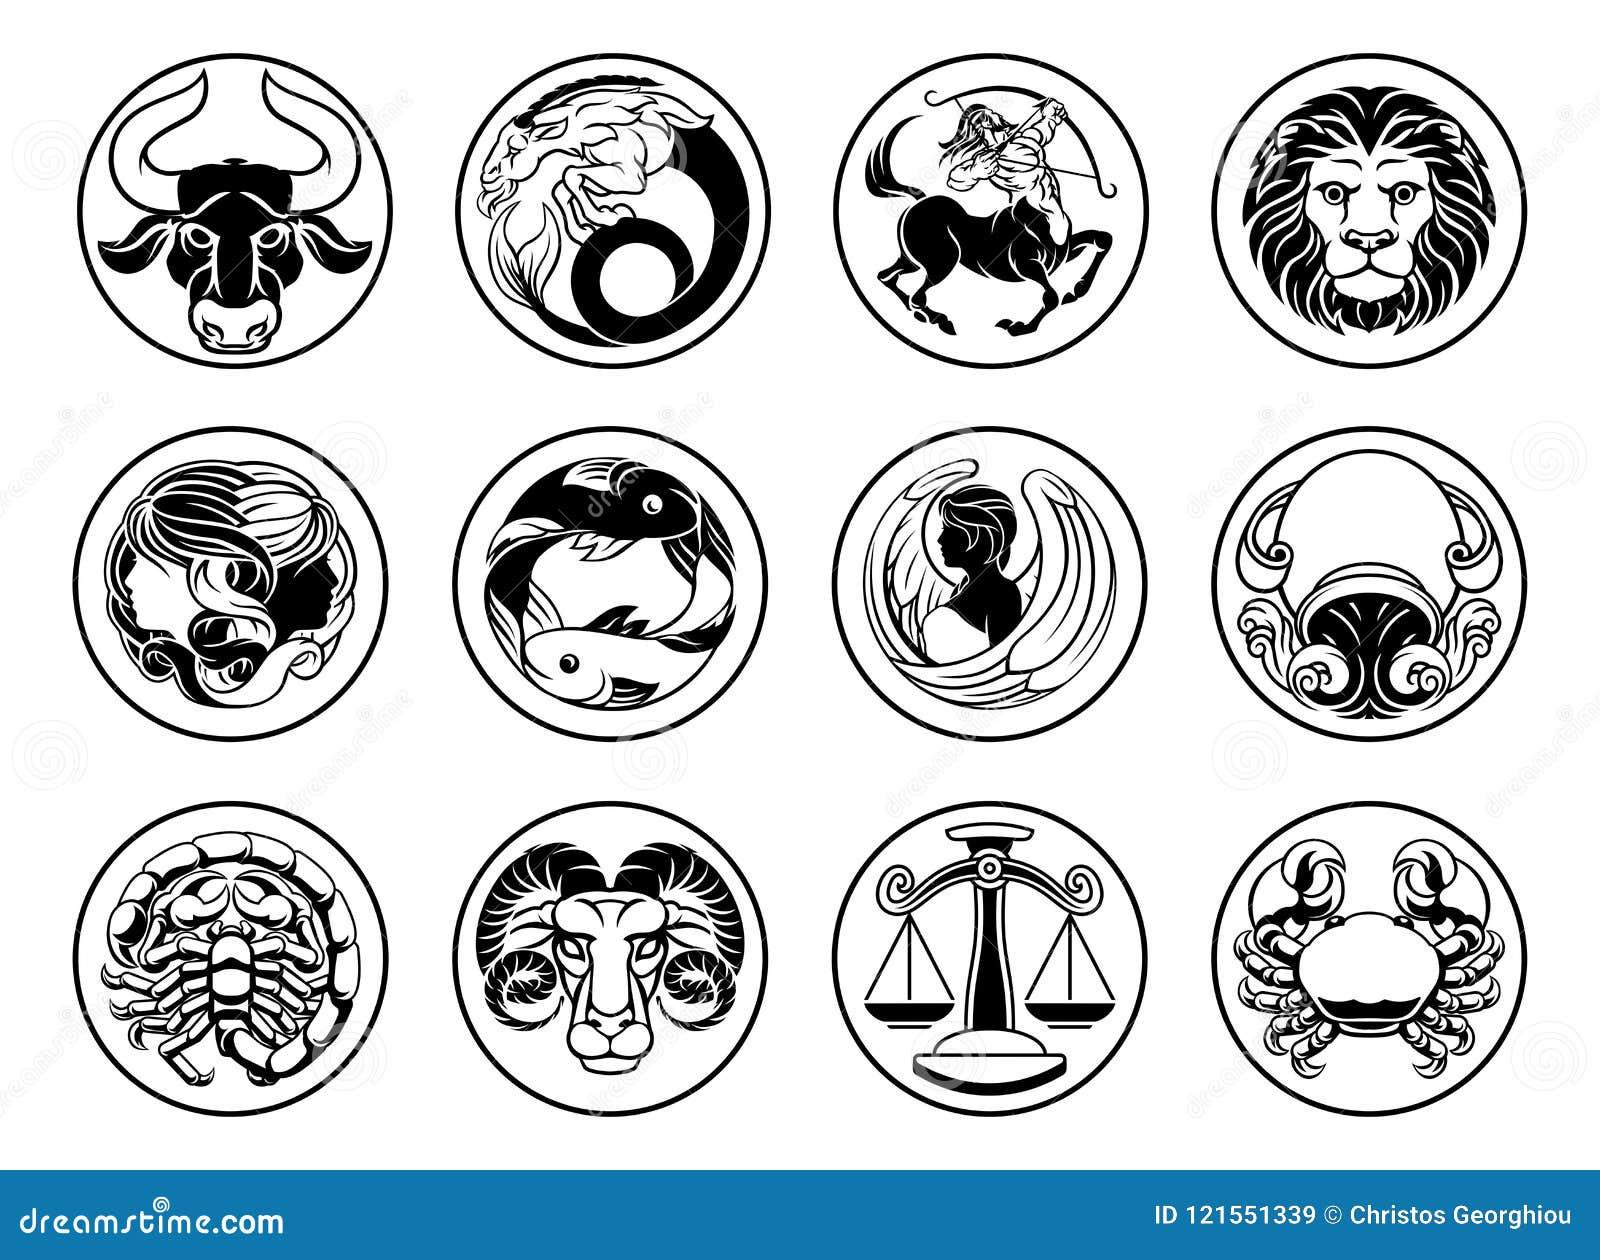 Zodiac Astrology Horoscope Star Signs Symbols Set Stock Vector